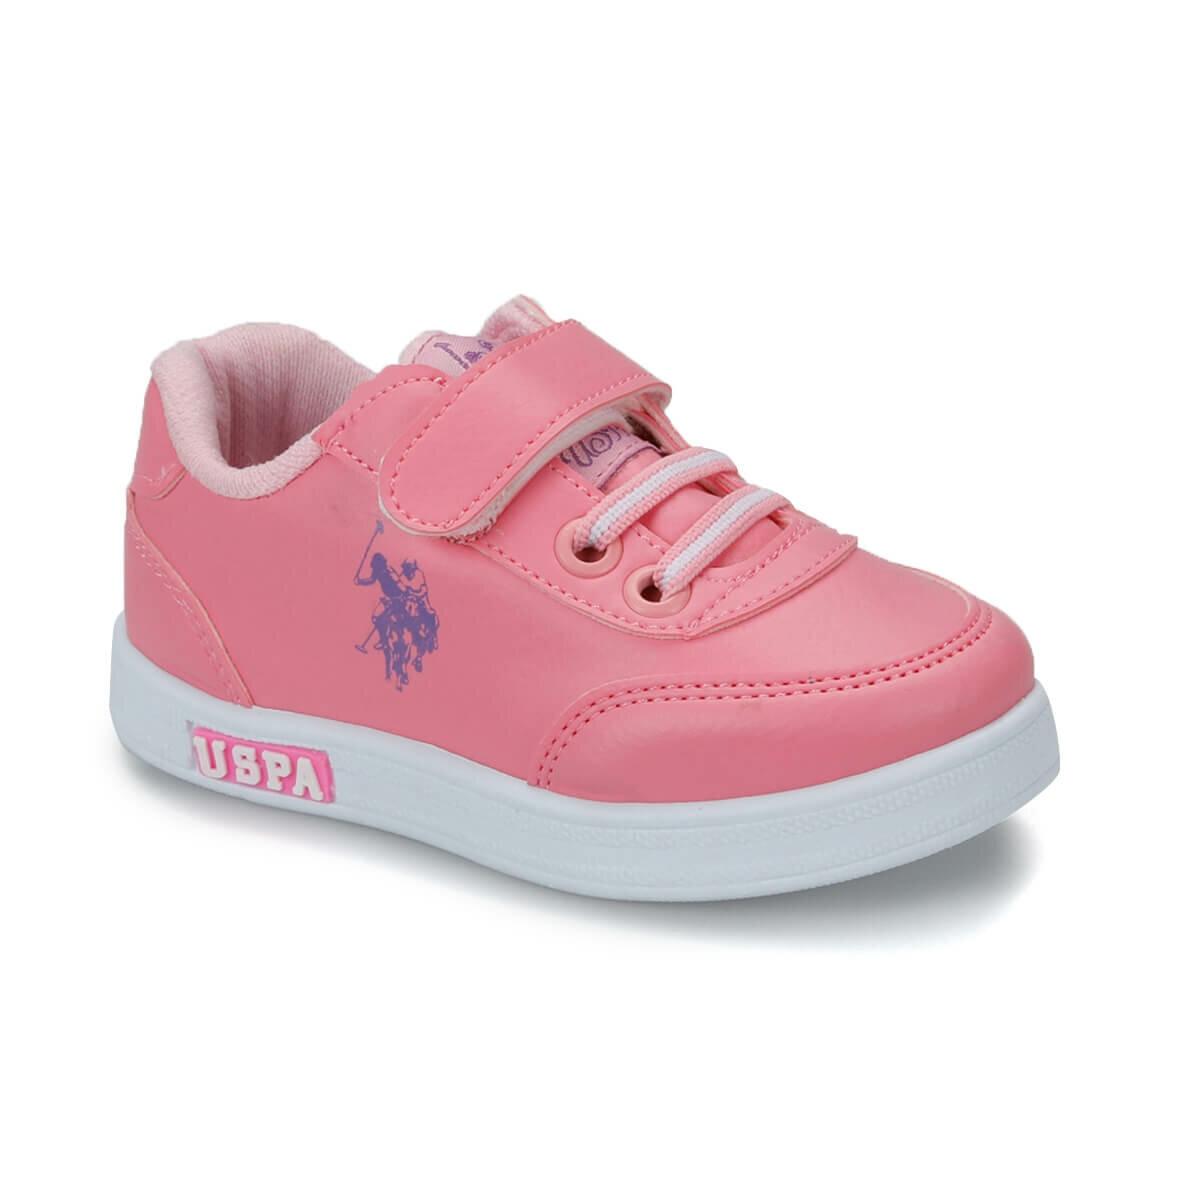 FLO CAMERON Pink Female Child Sneaker Shoes U.S. POLO ASSN.